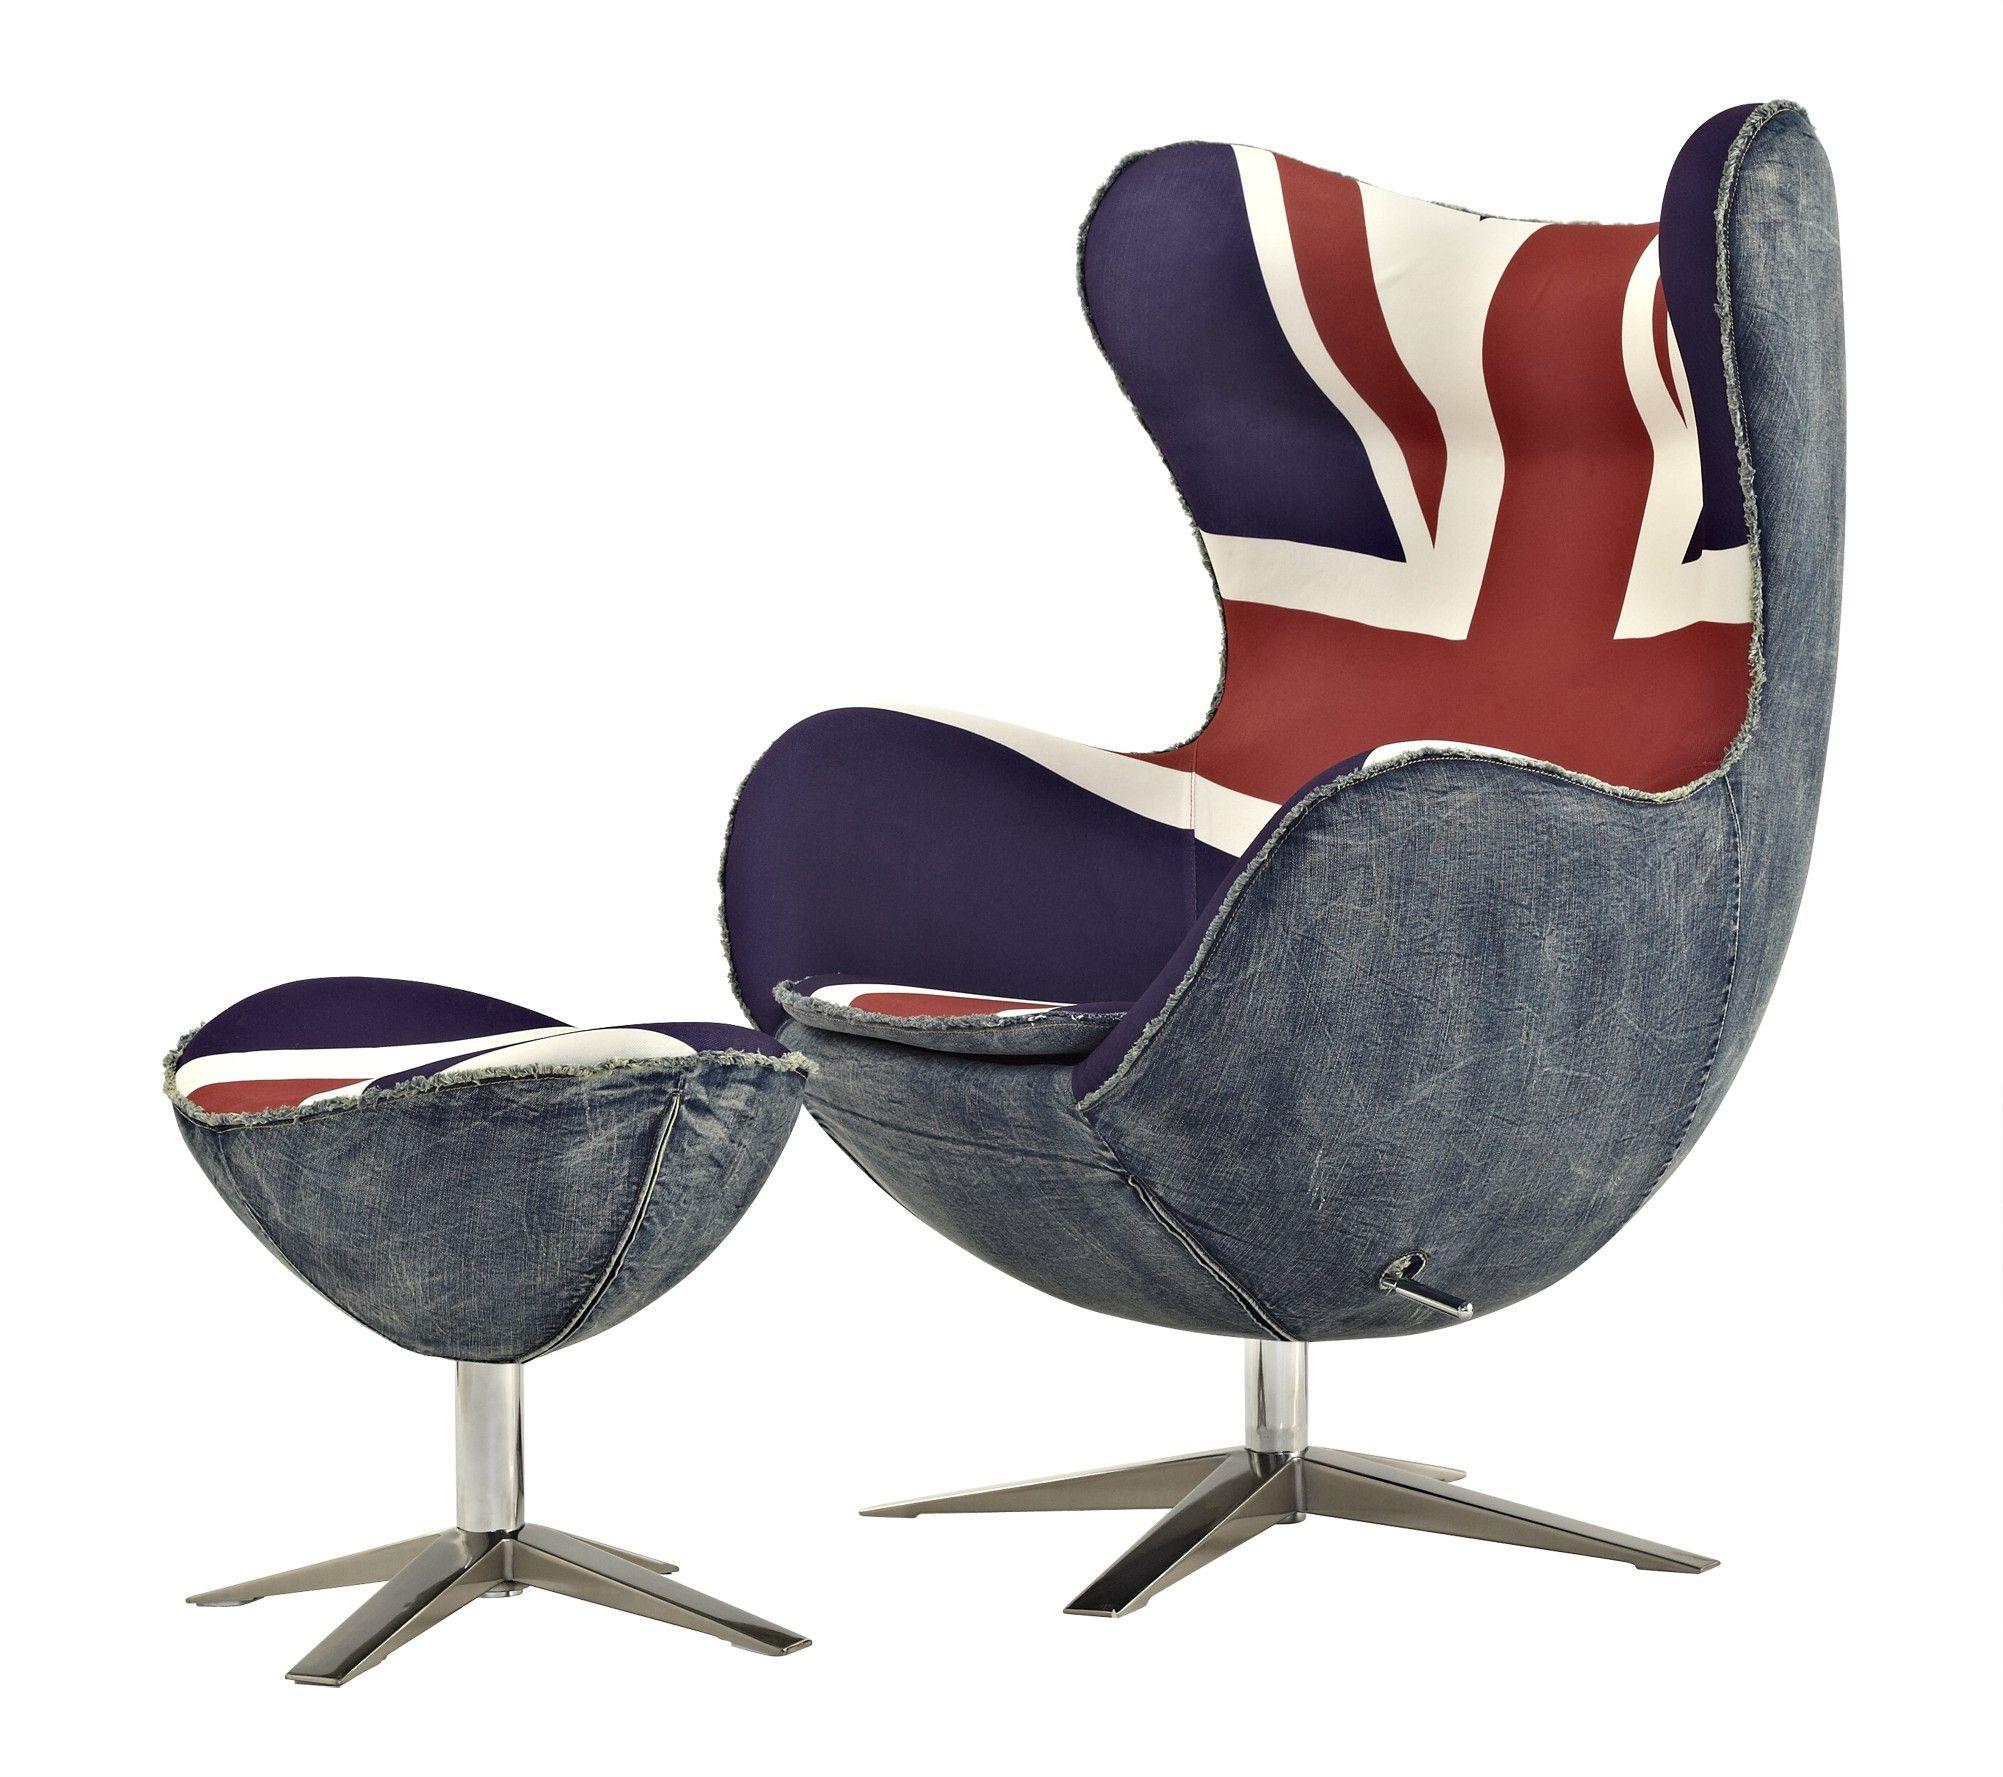 Bon Egg Chair Reproduction With Union Jack Print